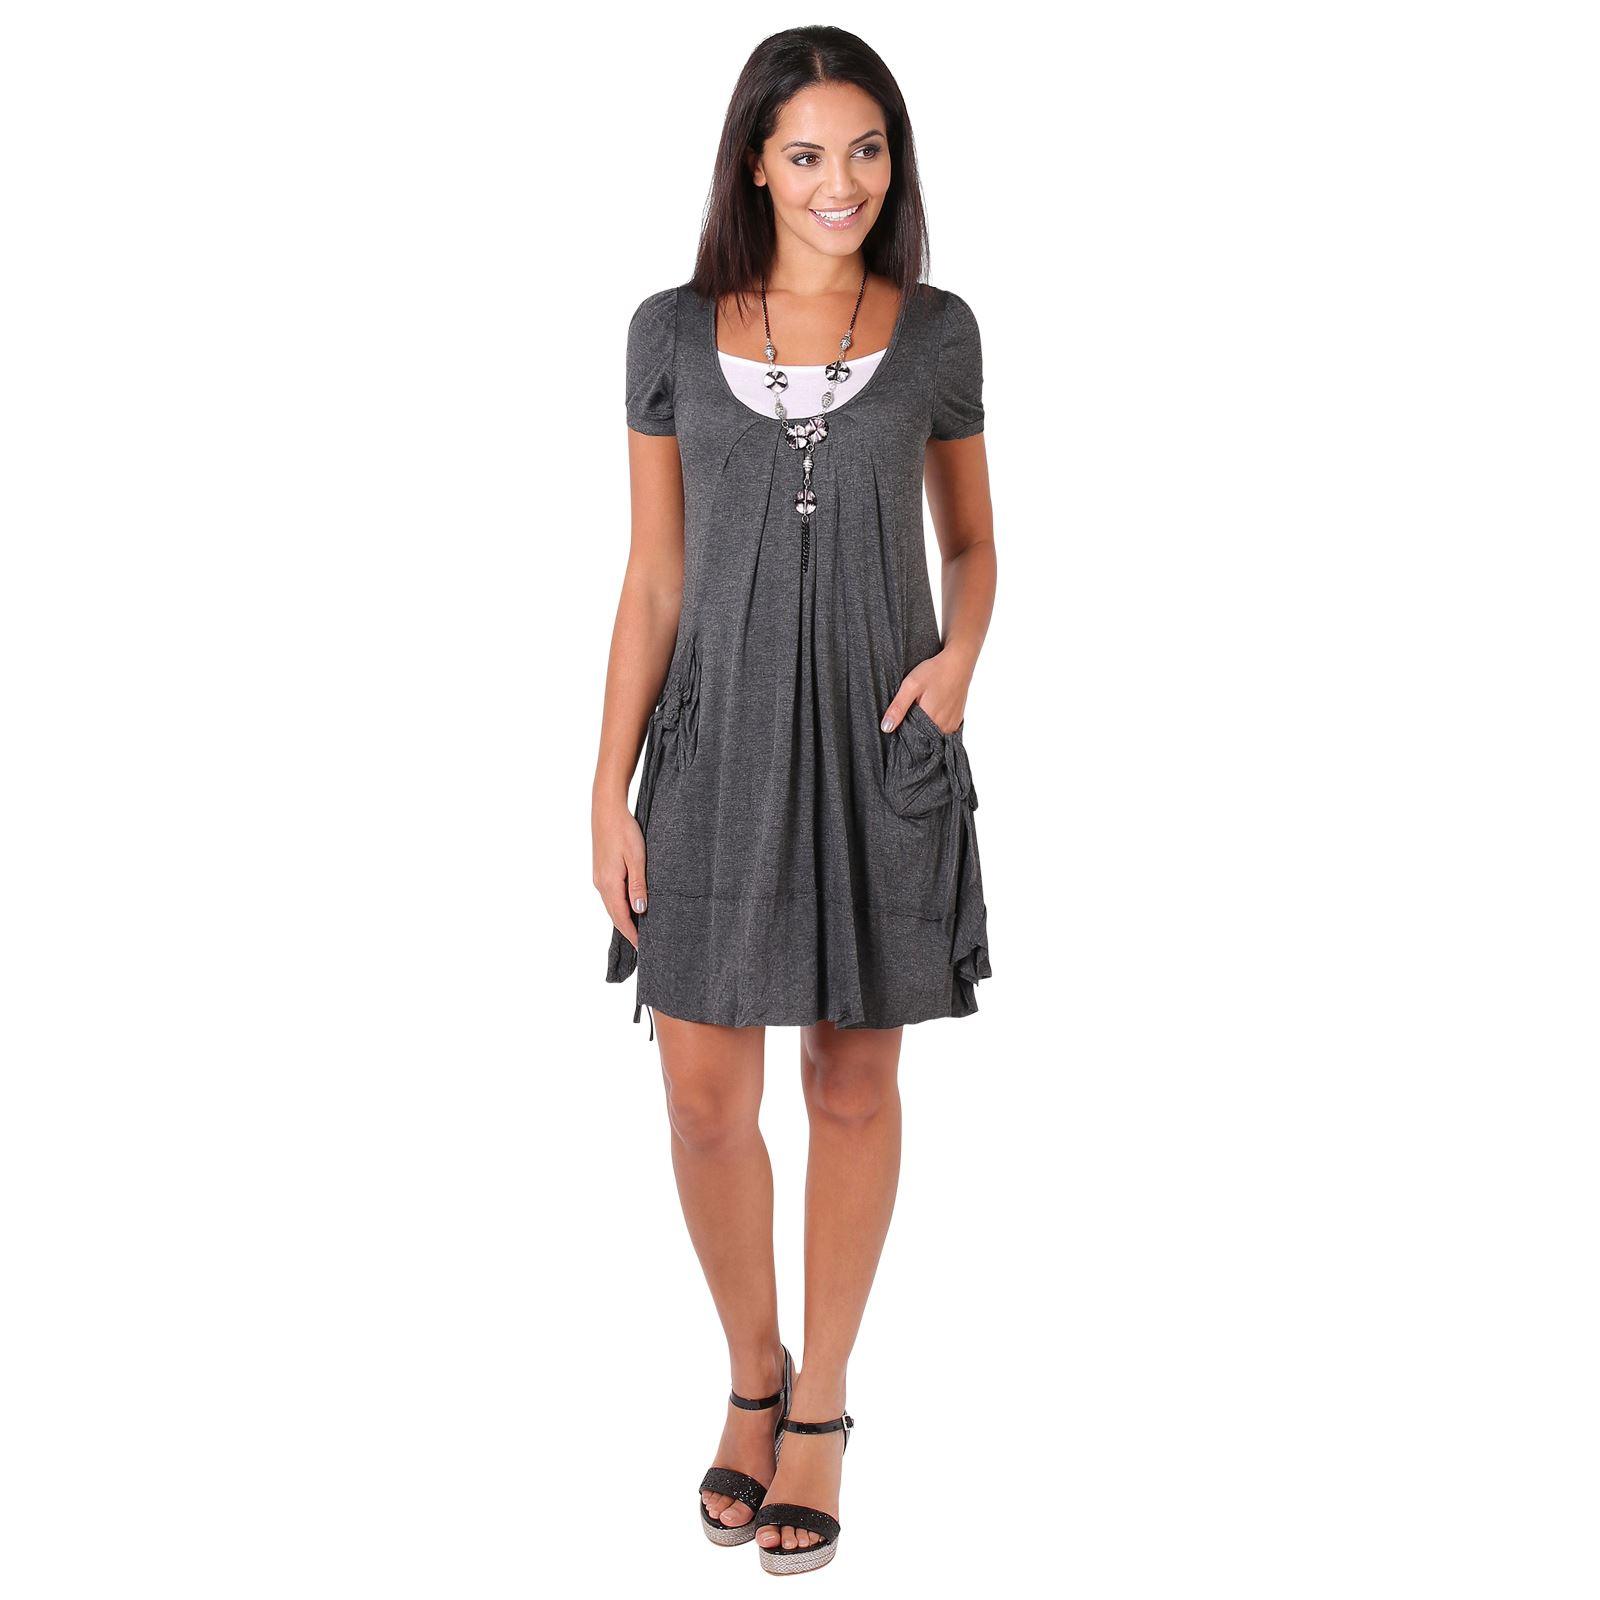 KRISP-Women-2-in-1-Boho-Gypsy-Tunic-Dress-Top-Tee-Jersey-Pleated-A-Line-Necklace thumbnail 6